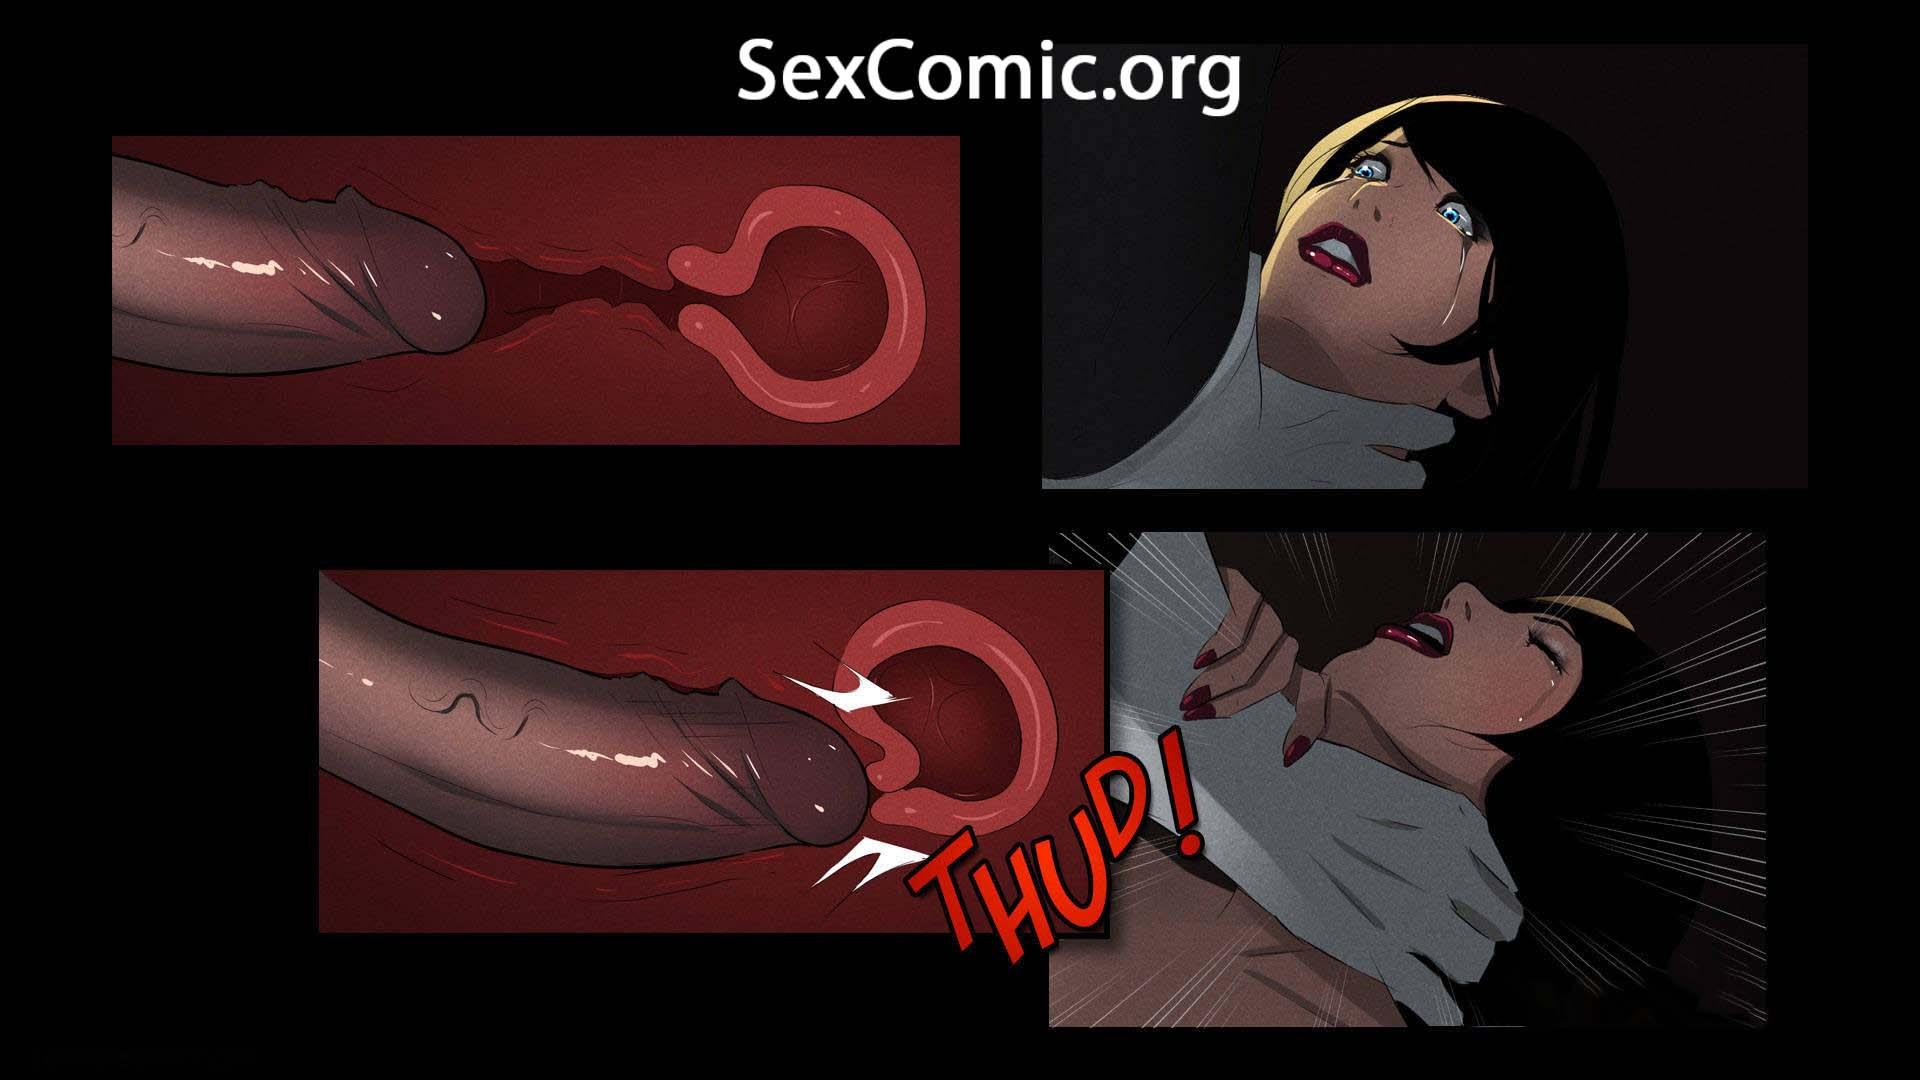 comics-marvel-xxx-vengandose-de-zatana-mangas-para-adultos-fantasias-sexuales-hentai-videos-porno-gratis-comics-de-zoofilia-comics-incesto-17